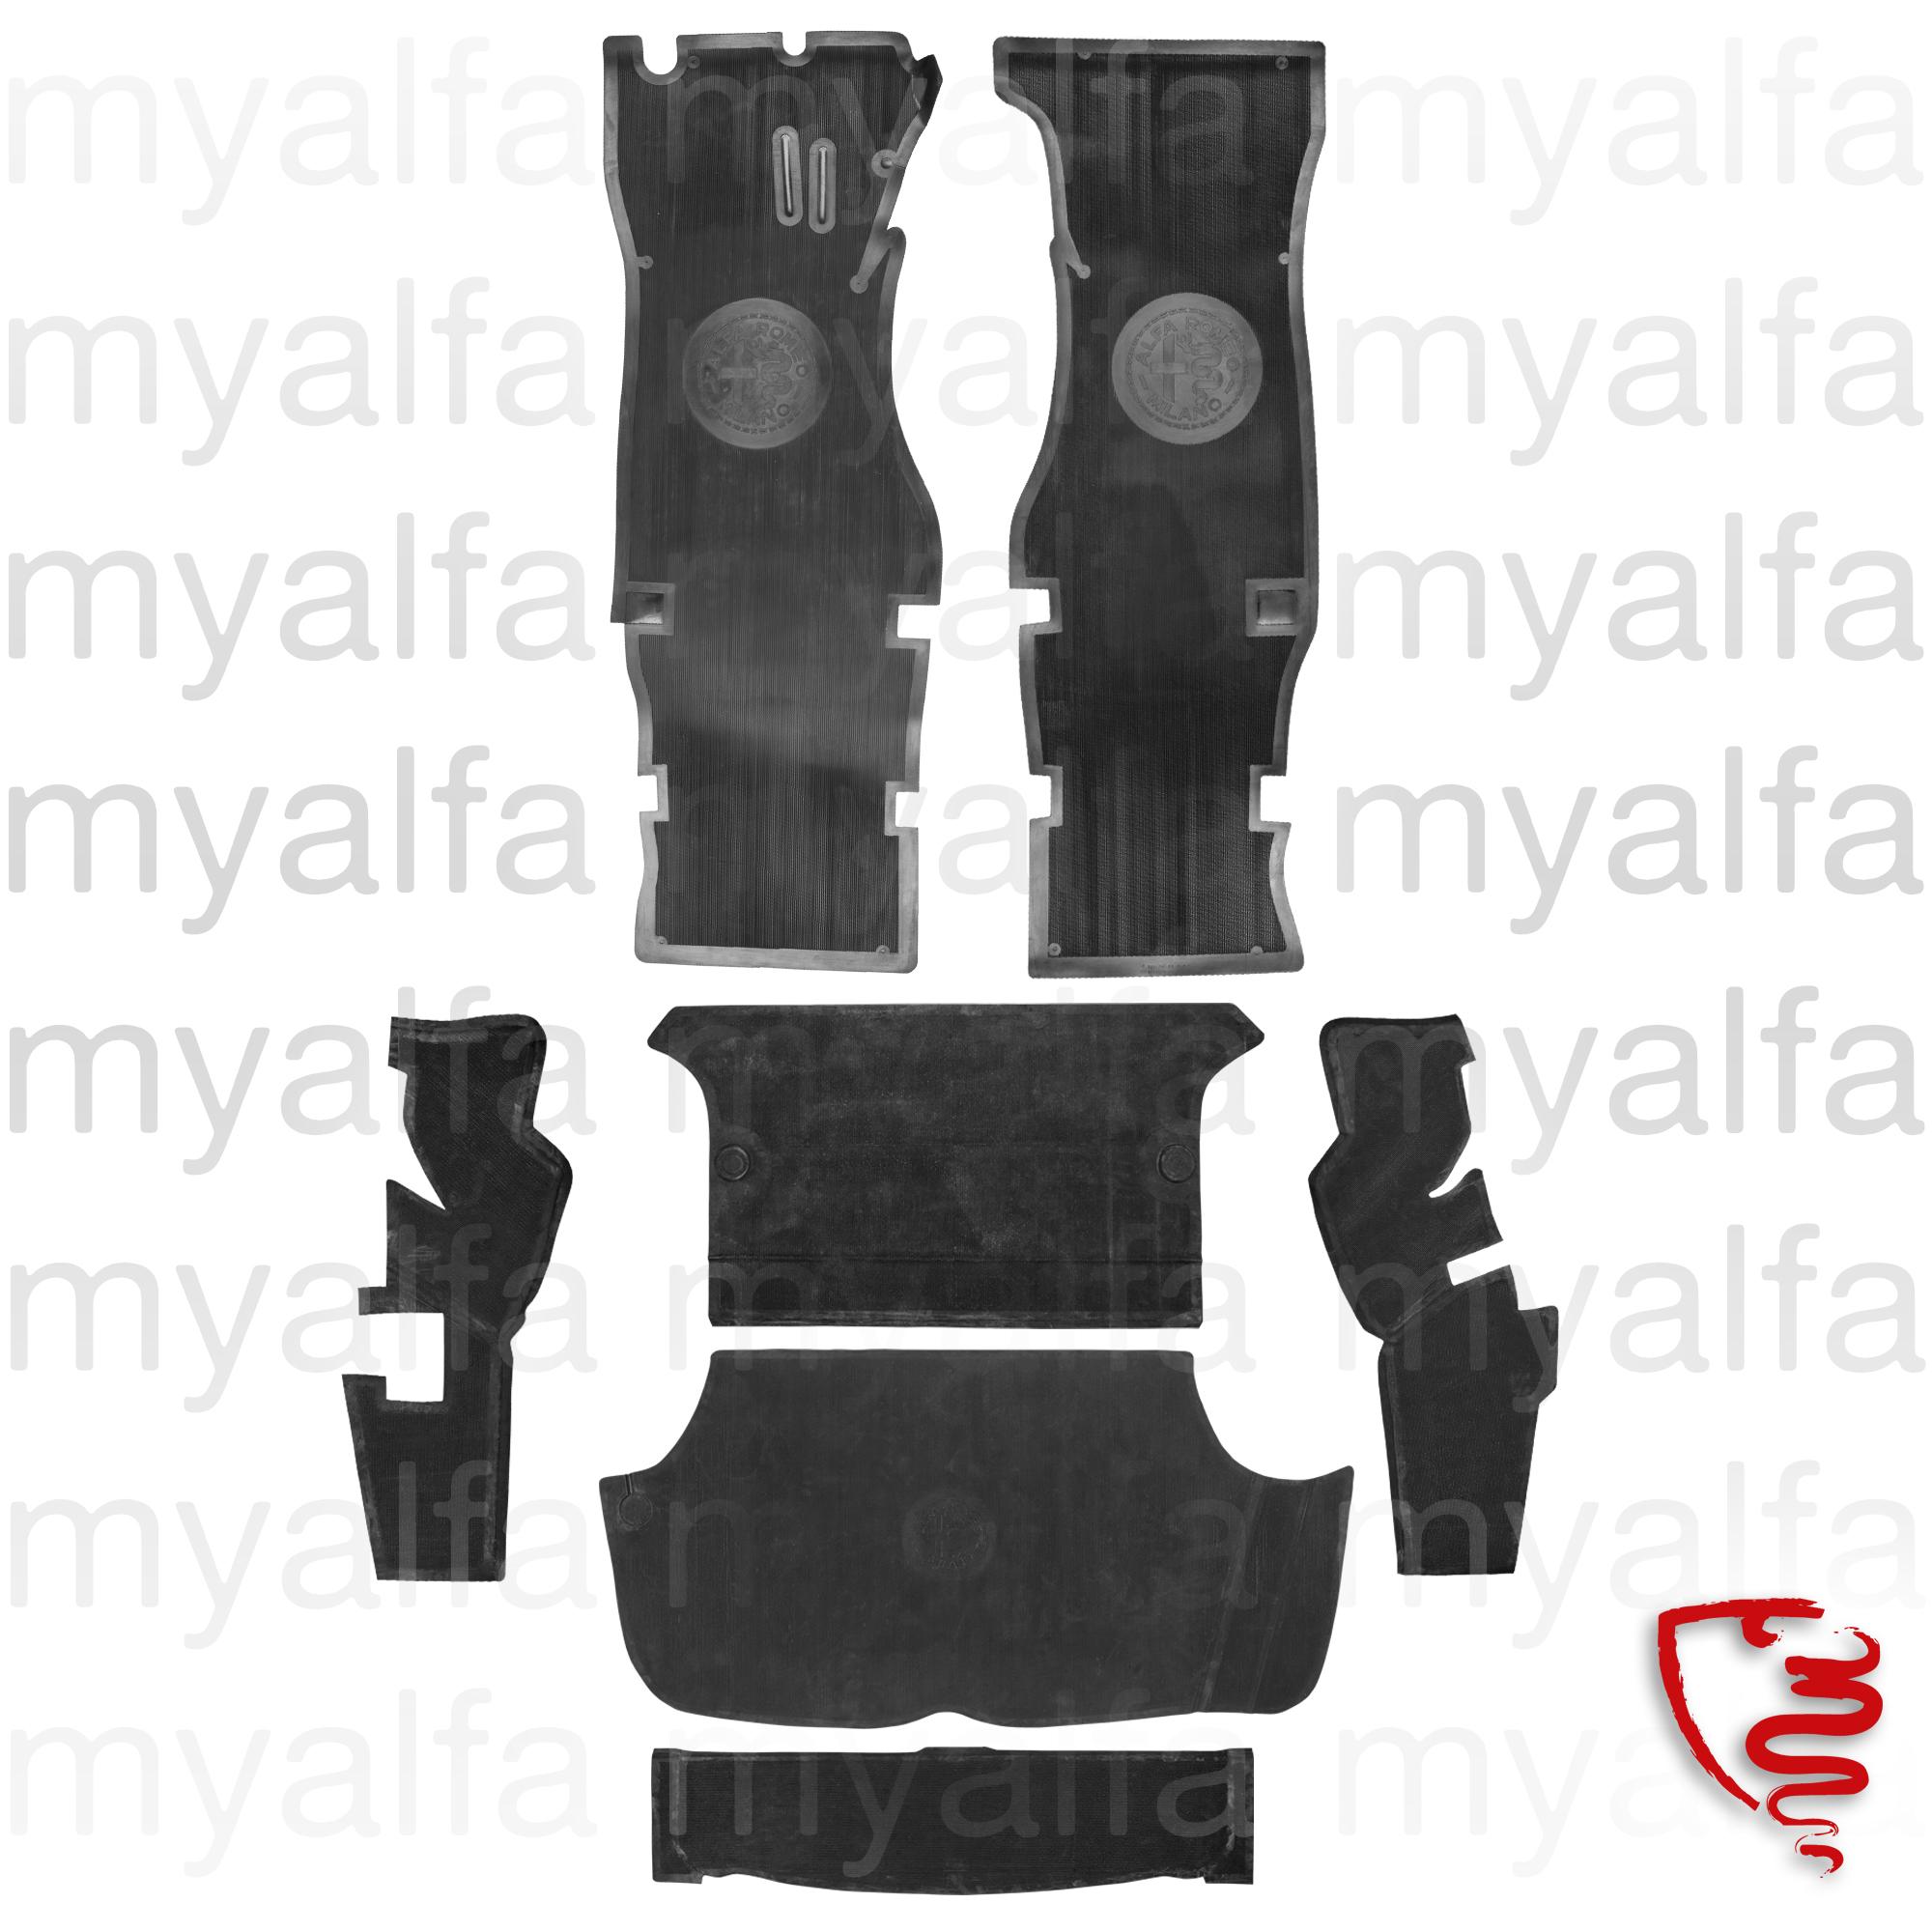 Set of rubber mats GT Bertone - Black for 105/115, Coupe, Interior, Flooring, Rubber mats